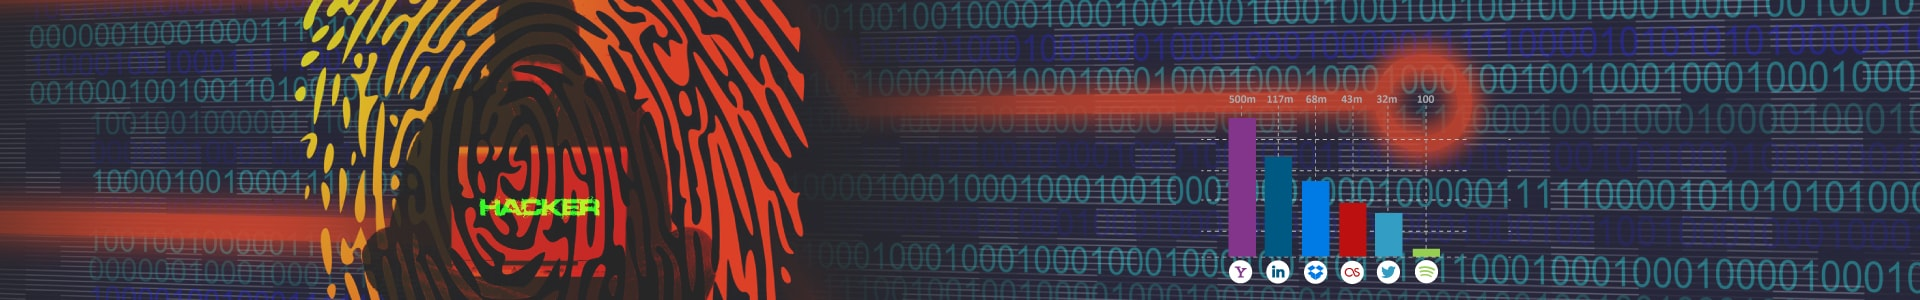 i-sprint-e2ee-password-hack-banner